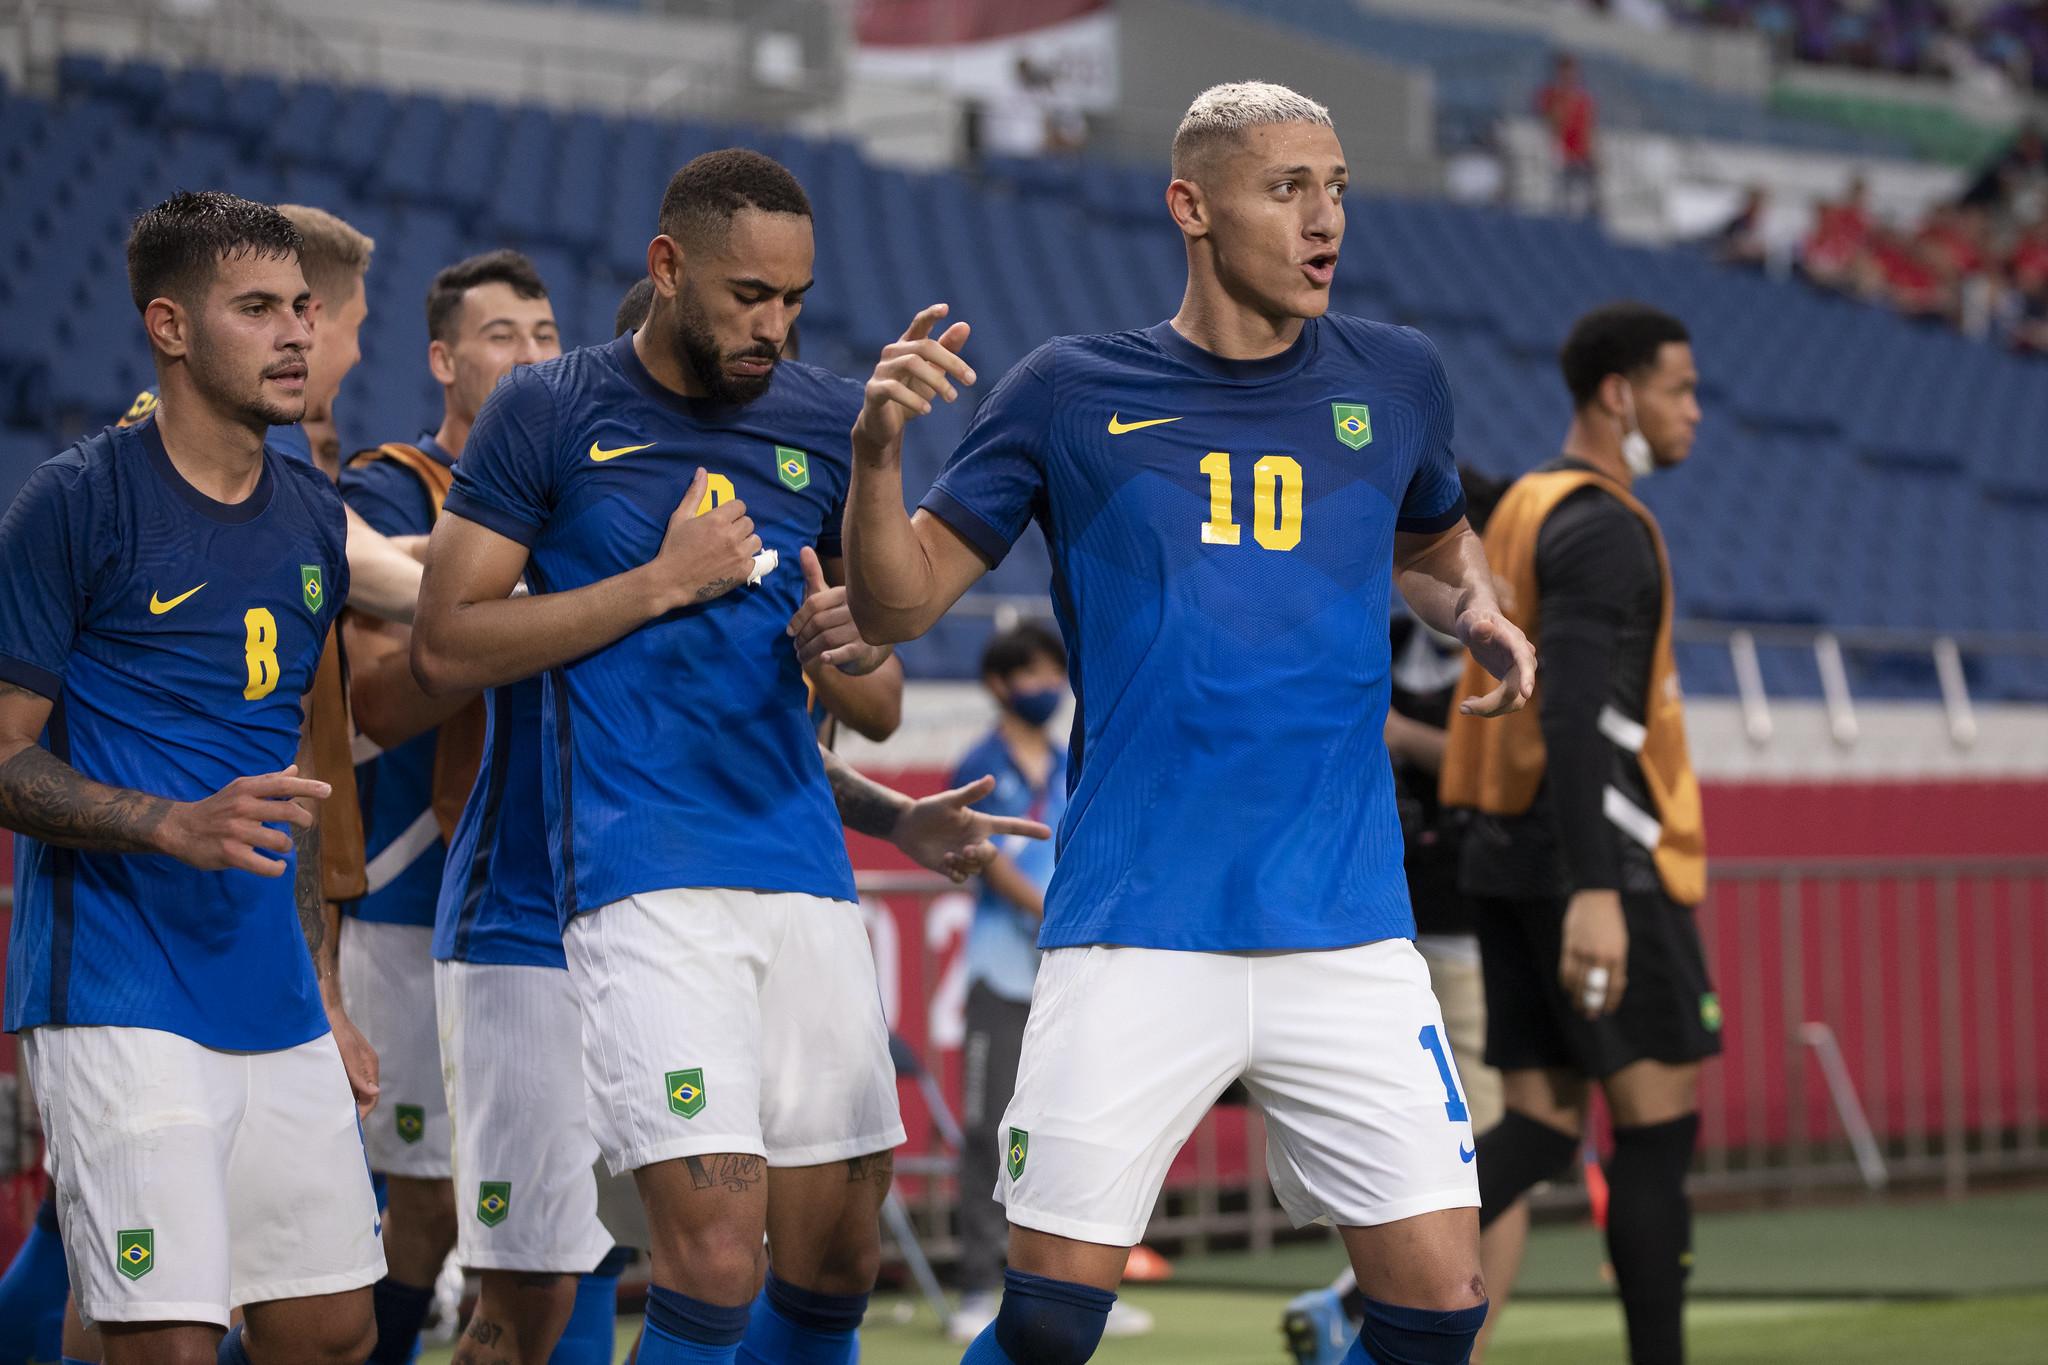 Brasil se classifica em primeiro no futebol masculino